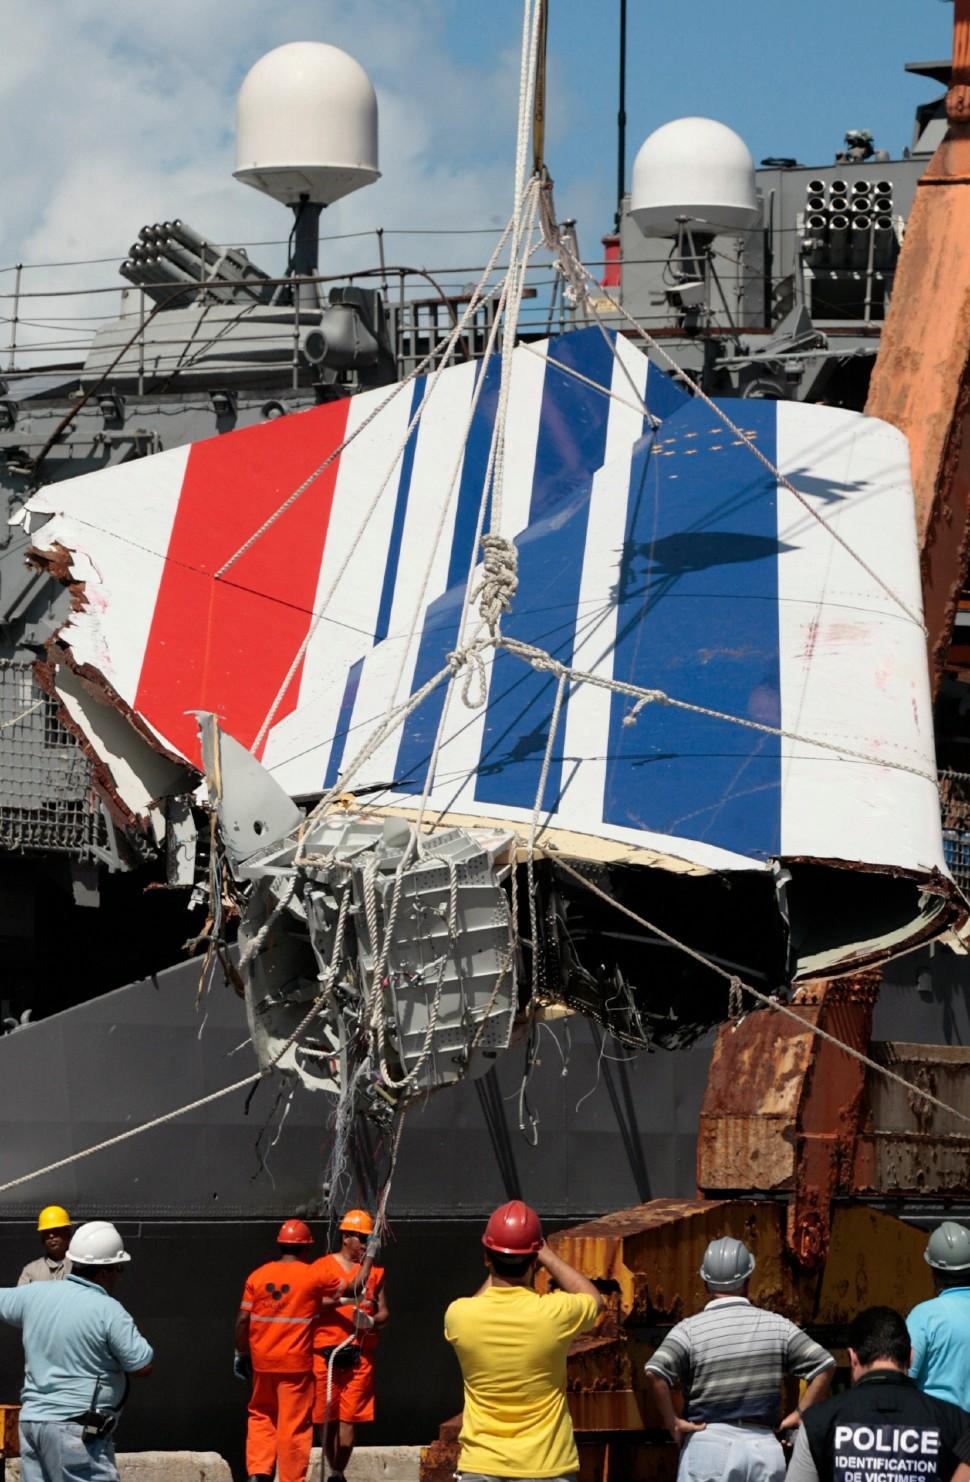 AF447 debris c Eraldo Peres AP Shutterstock rexfea